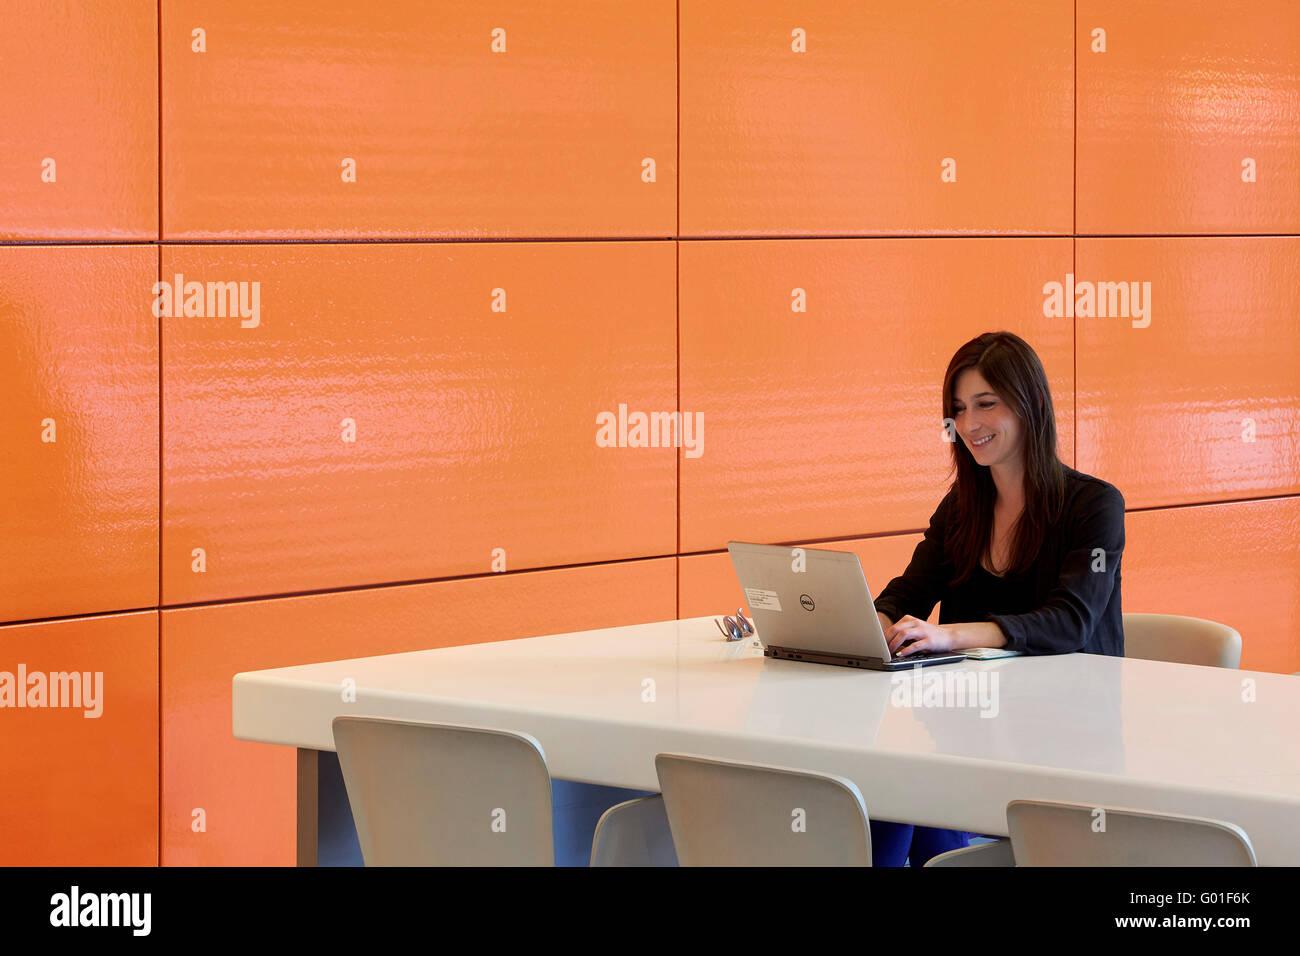 Work desk and iconic orange colored ceramic tiles central saint work desk and iconic orange colored ceramic tiles central saint giles london united kingdom architect renzo piano building dailygadgetfo Images